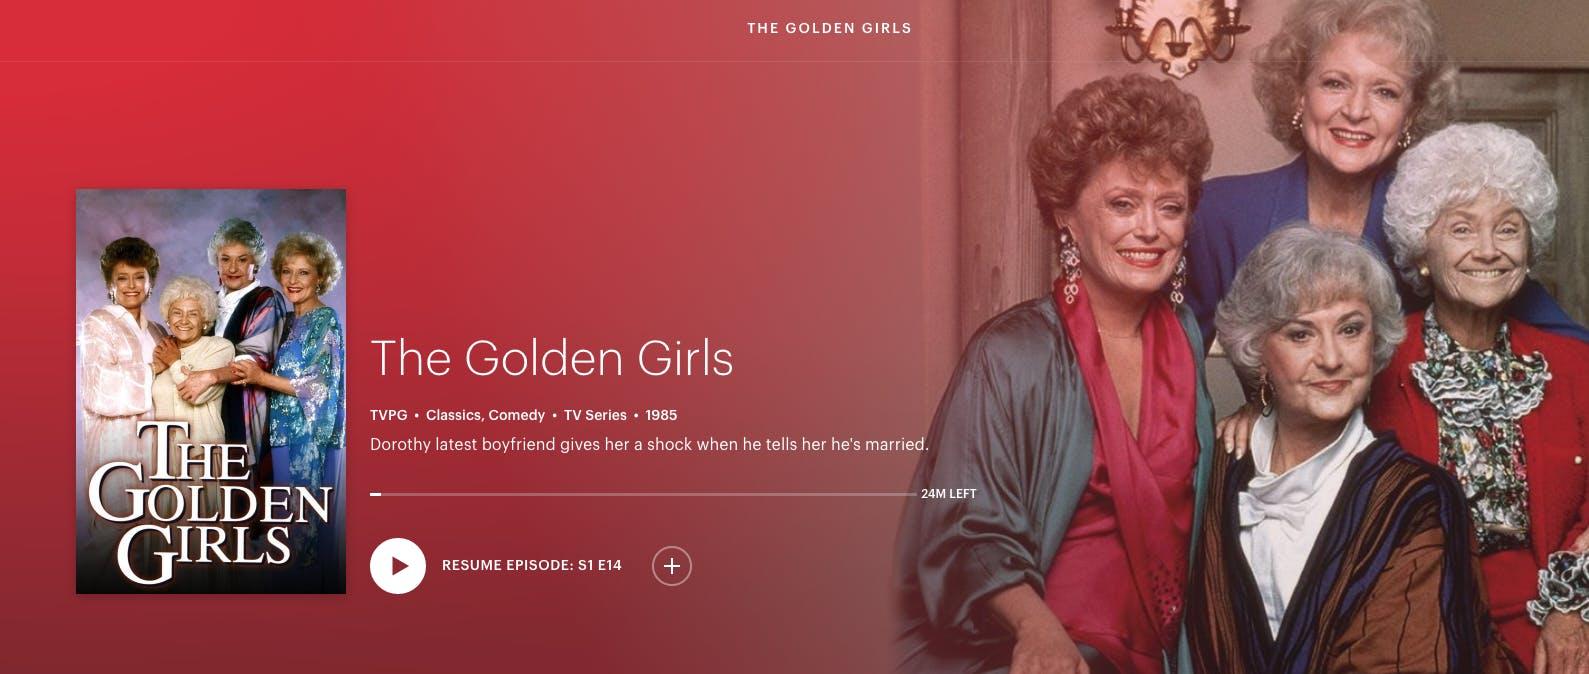 watch the golden girls free on Hulu